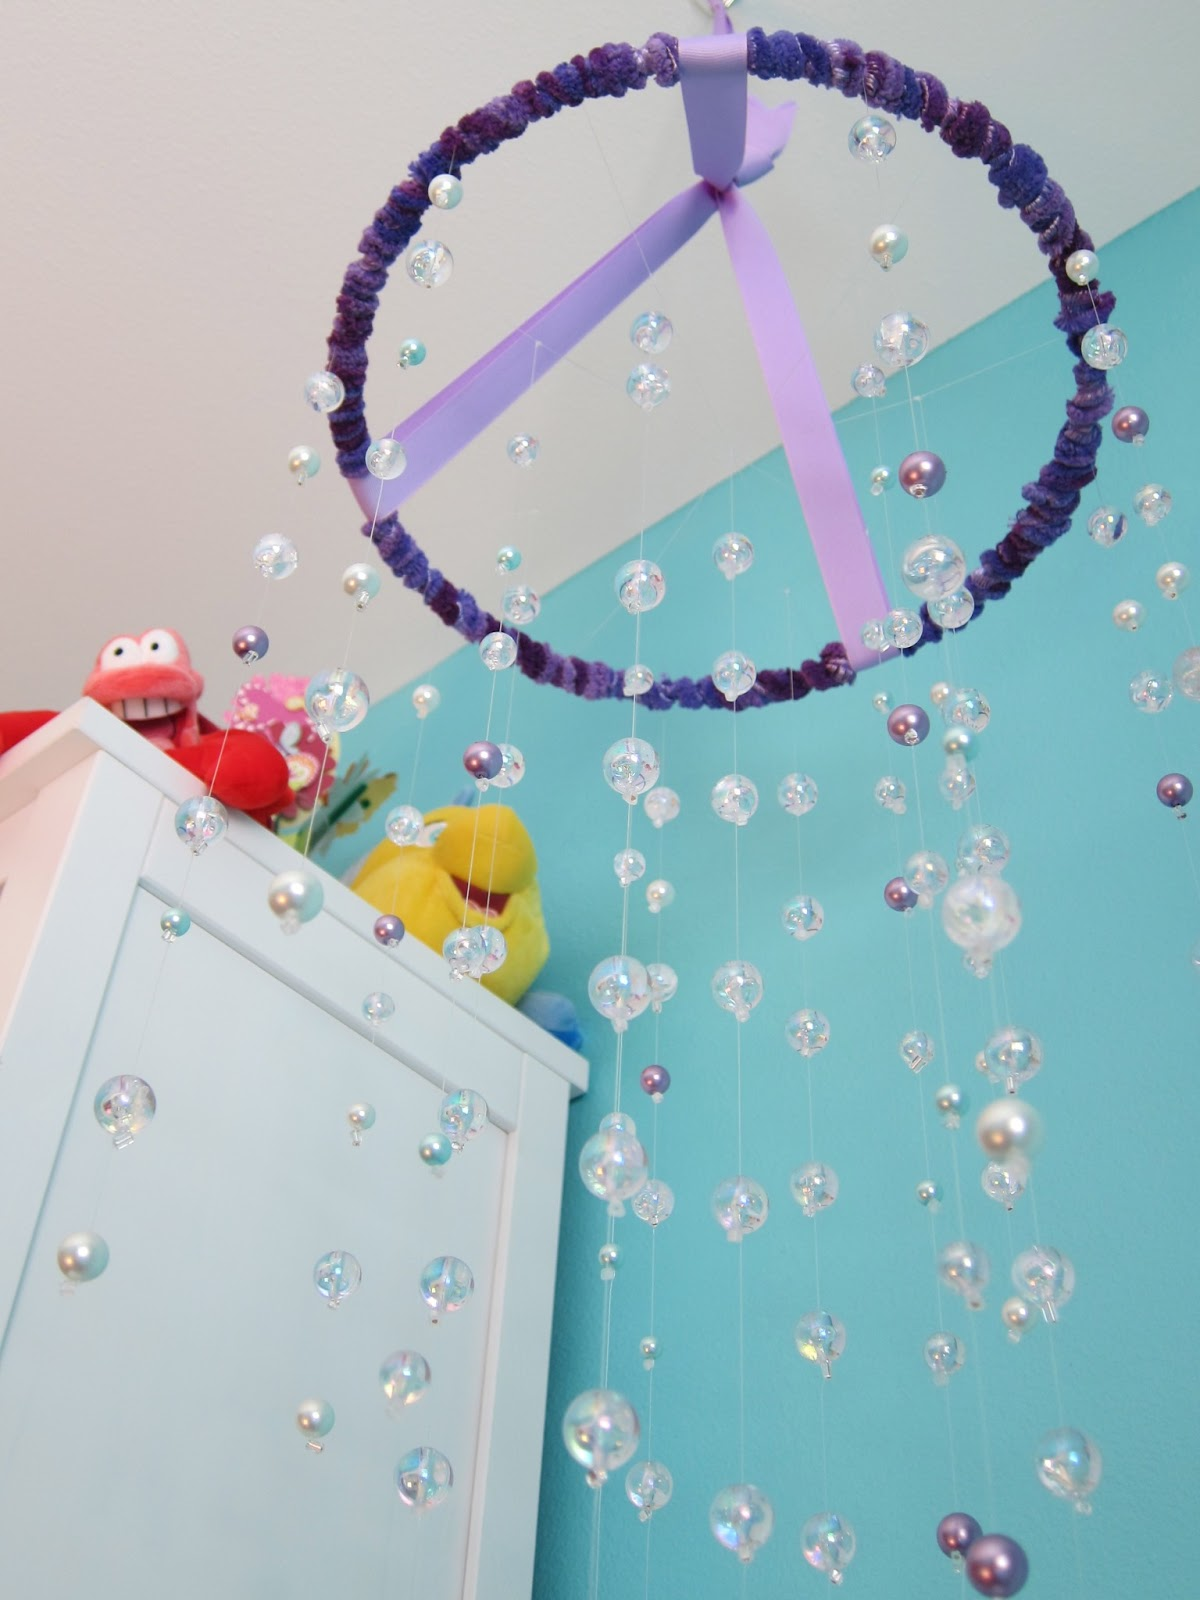 All Sorts Of Random Little Mermaid Room Bubble Mobile